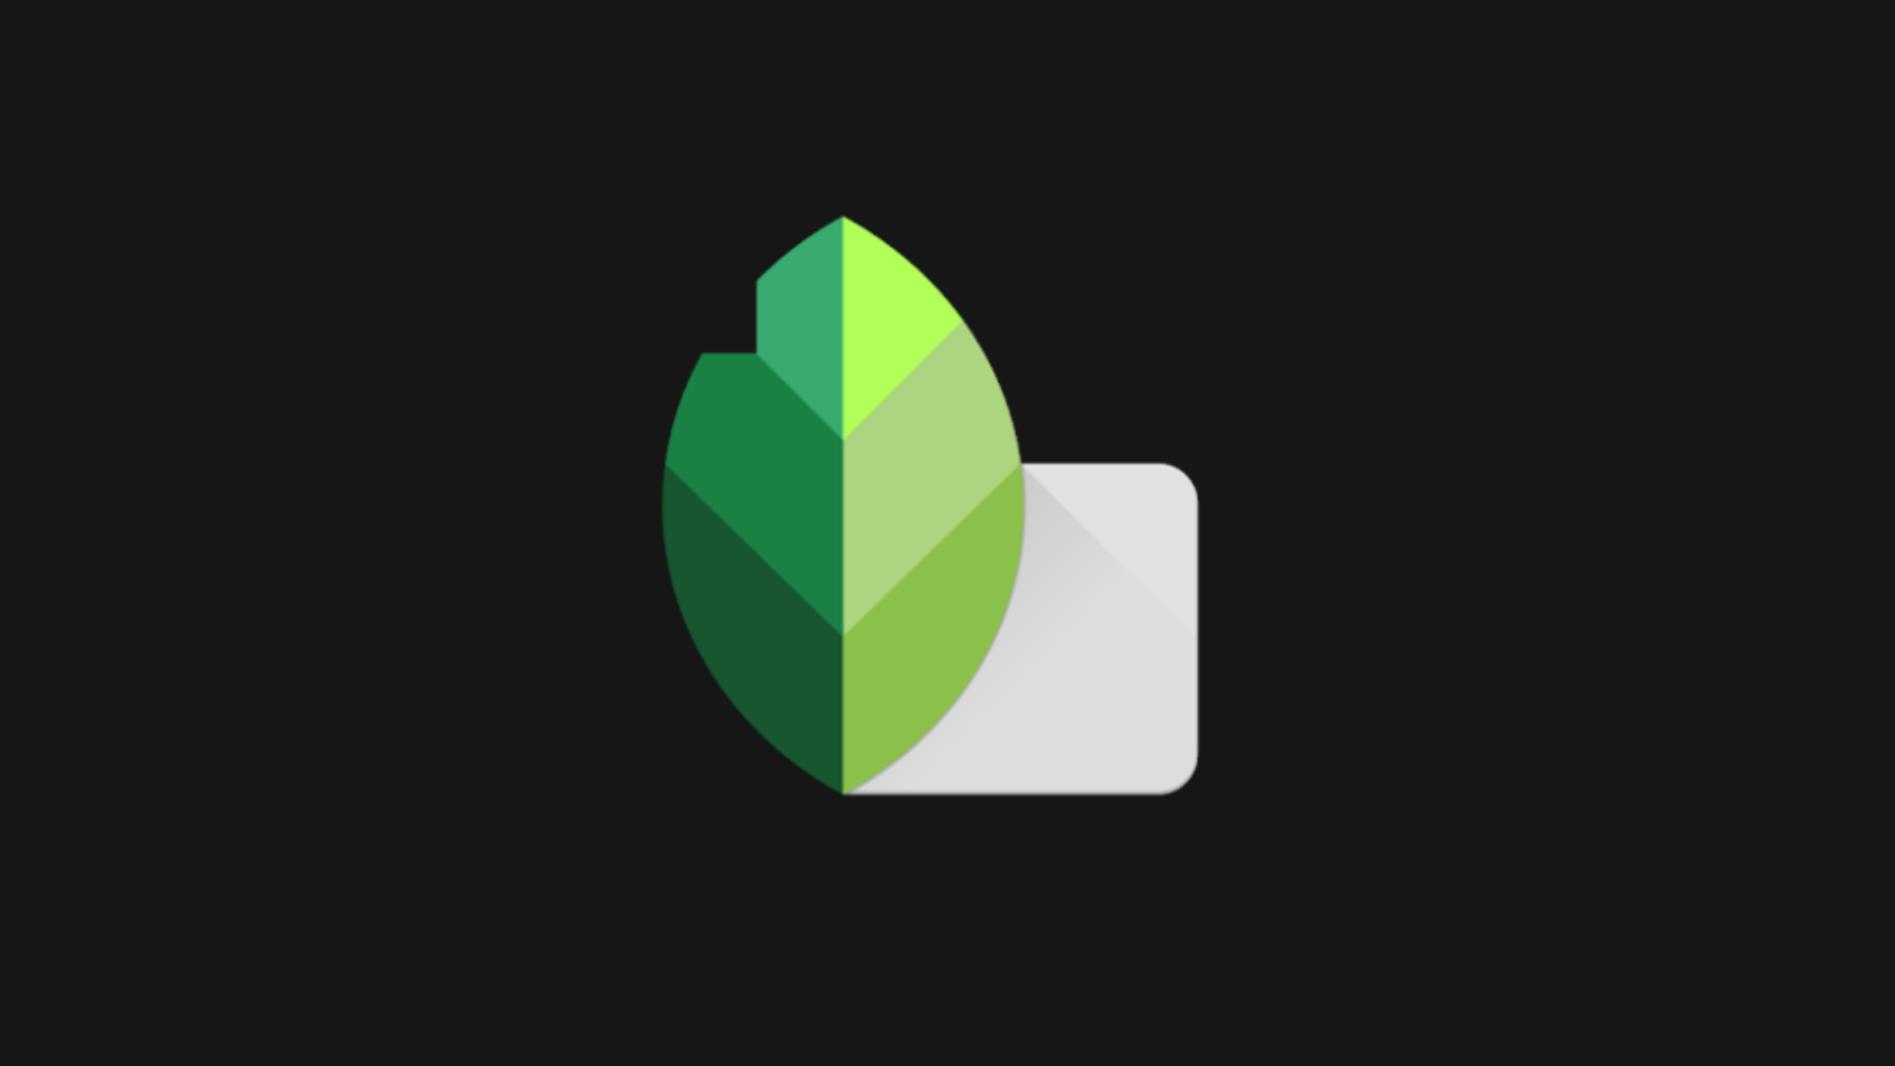 Snapseed v2.19 adds dark theme option [APK Download].